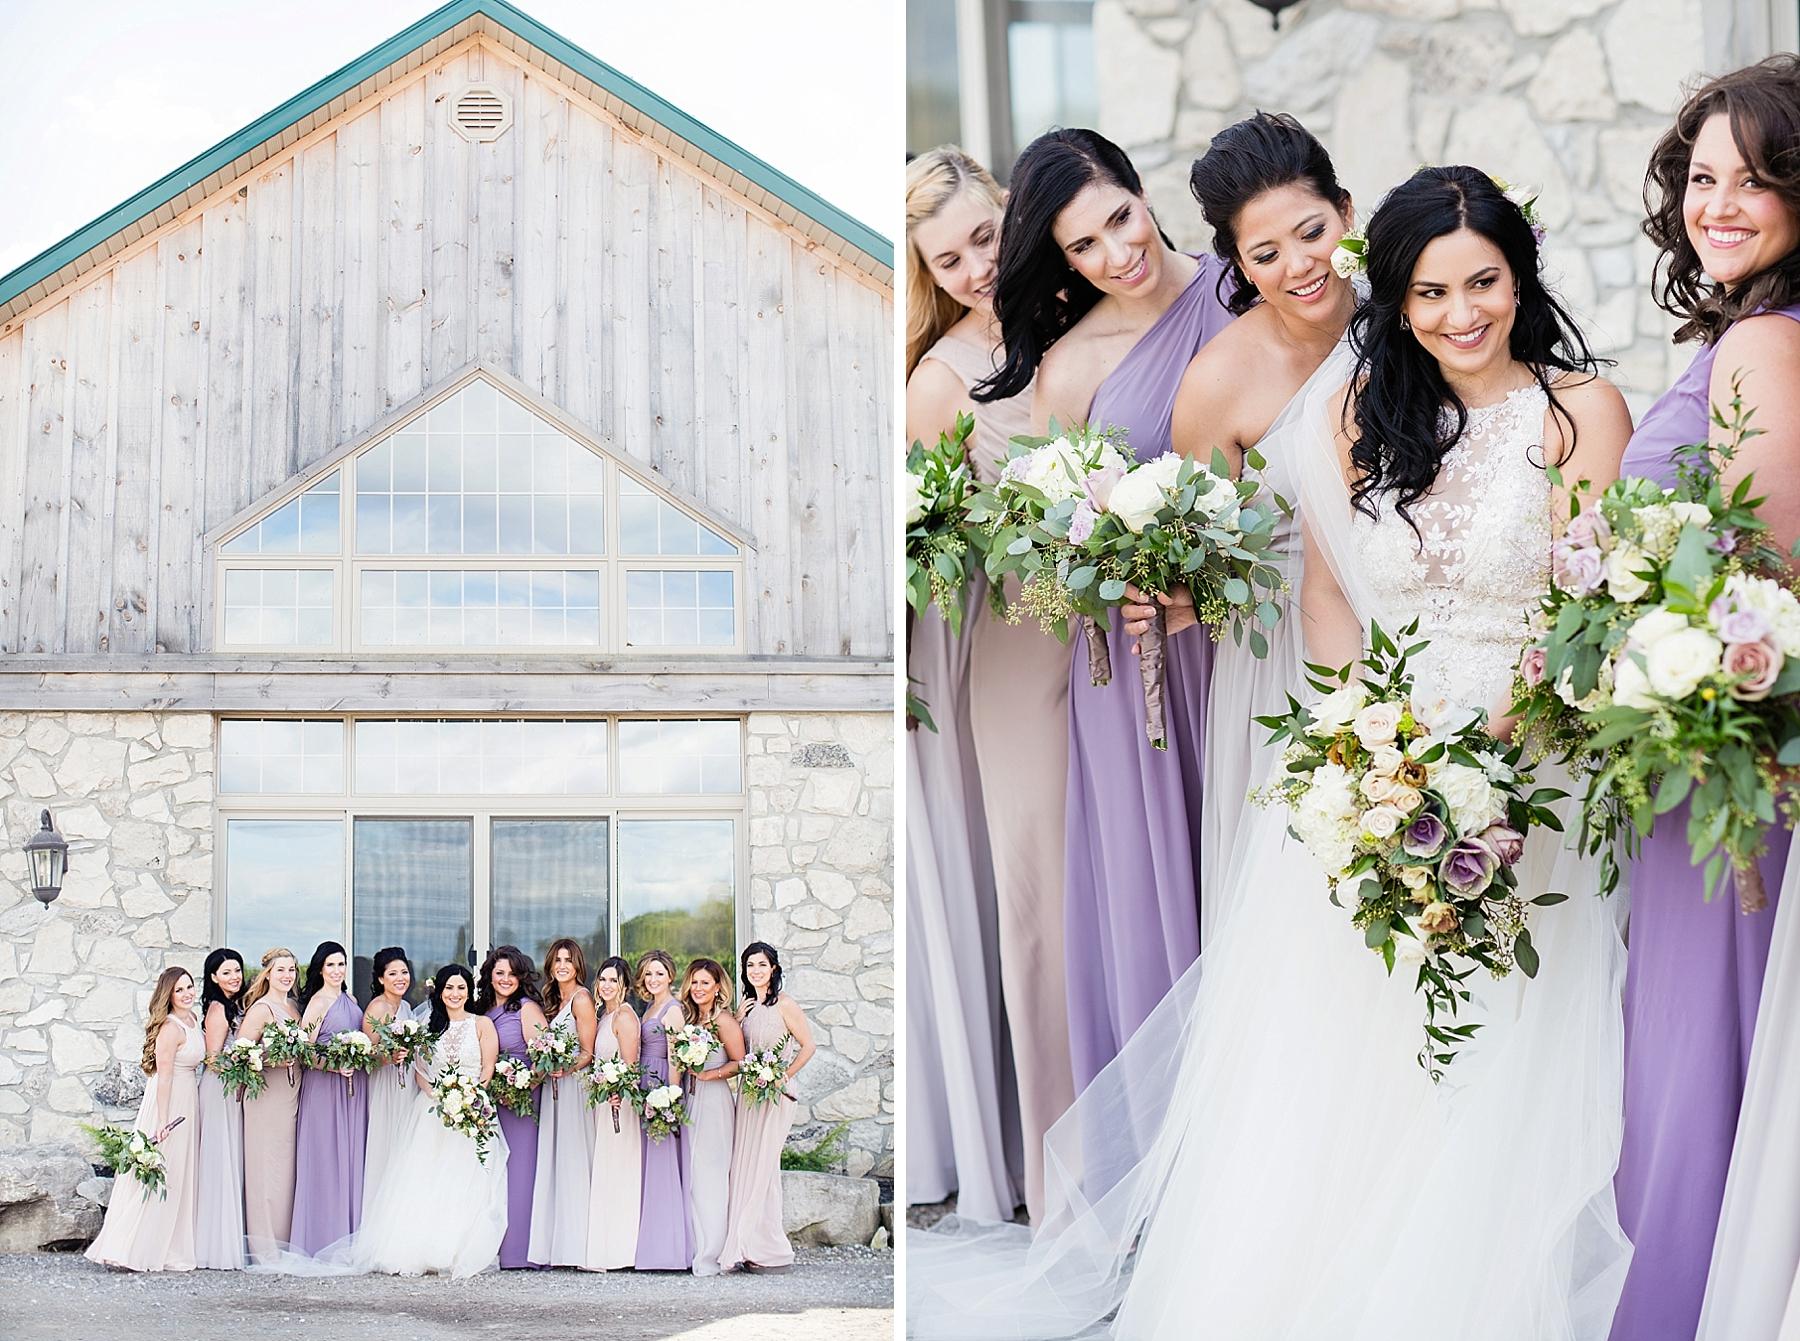 windsor-wedding-photographer-sprucewood-shores-winery-wedding-niagara-on-the-lake-wedding-photographer-eryn-shea-photography_0025.jpg